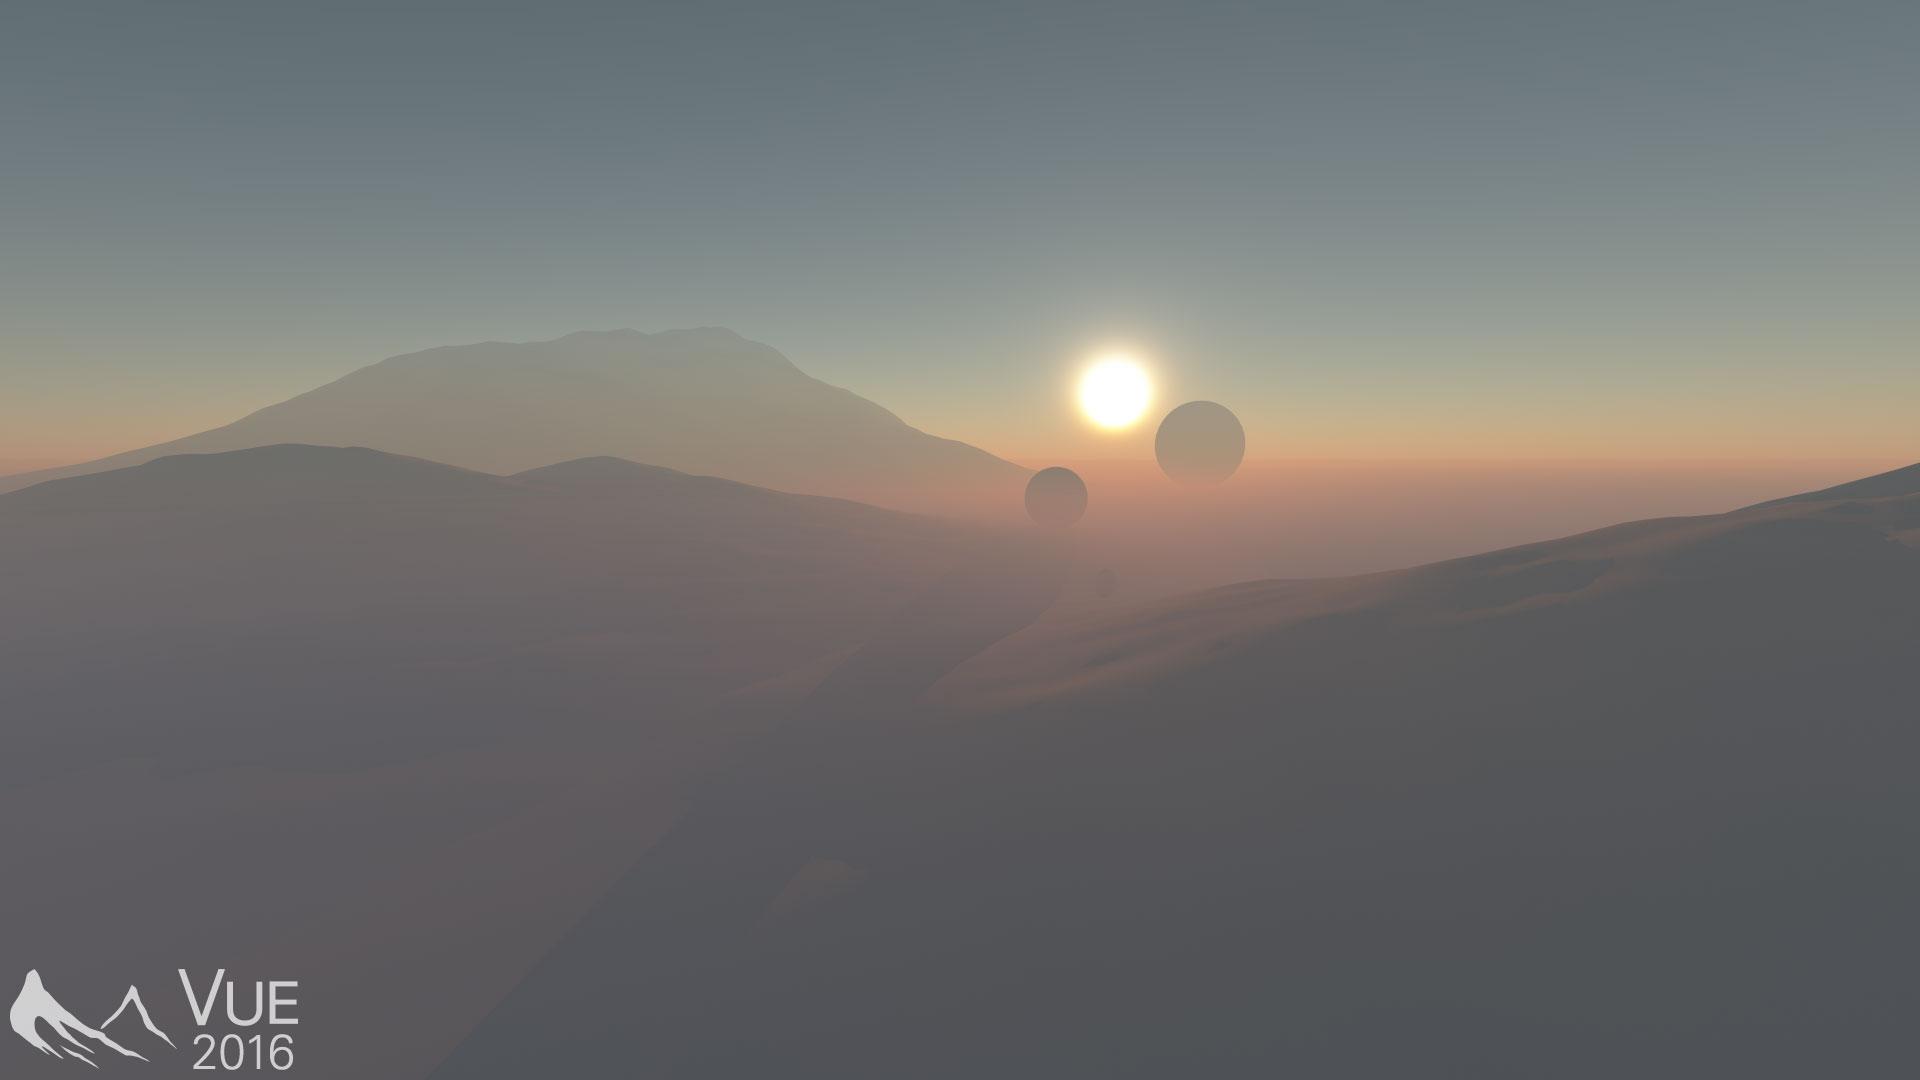 vue2016_aerial_wm